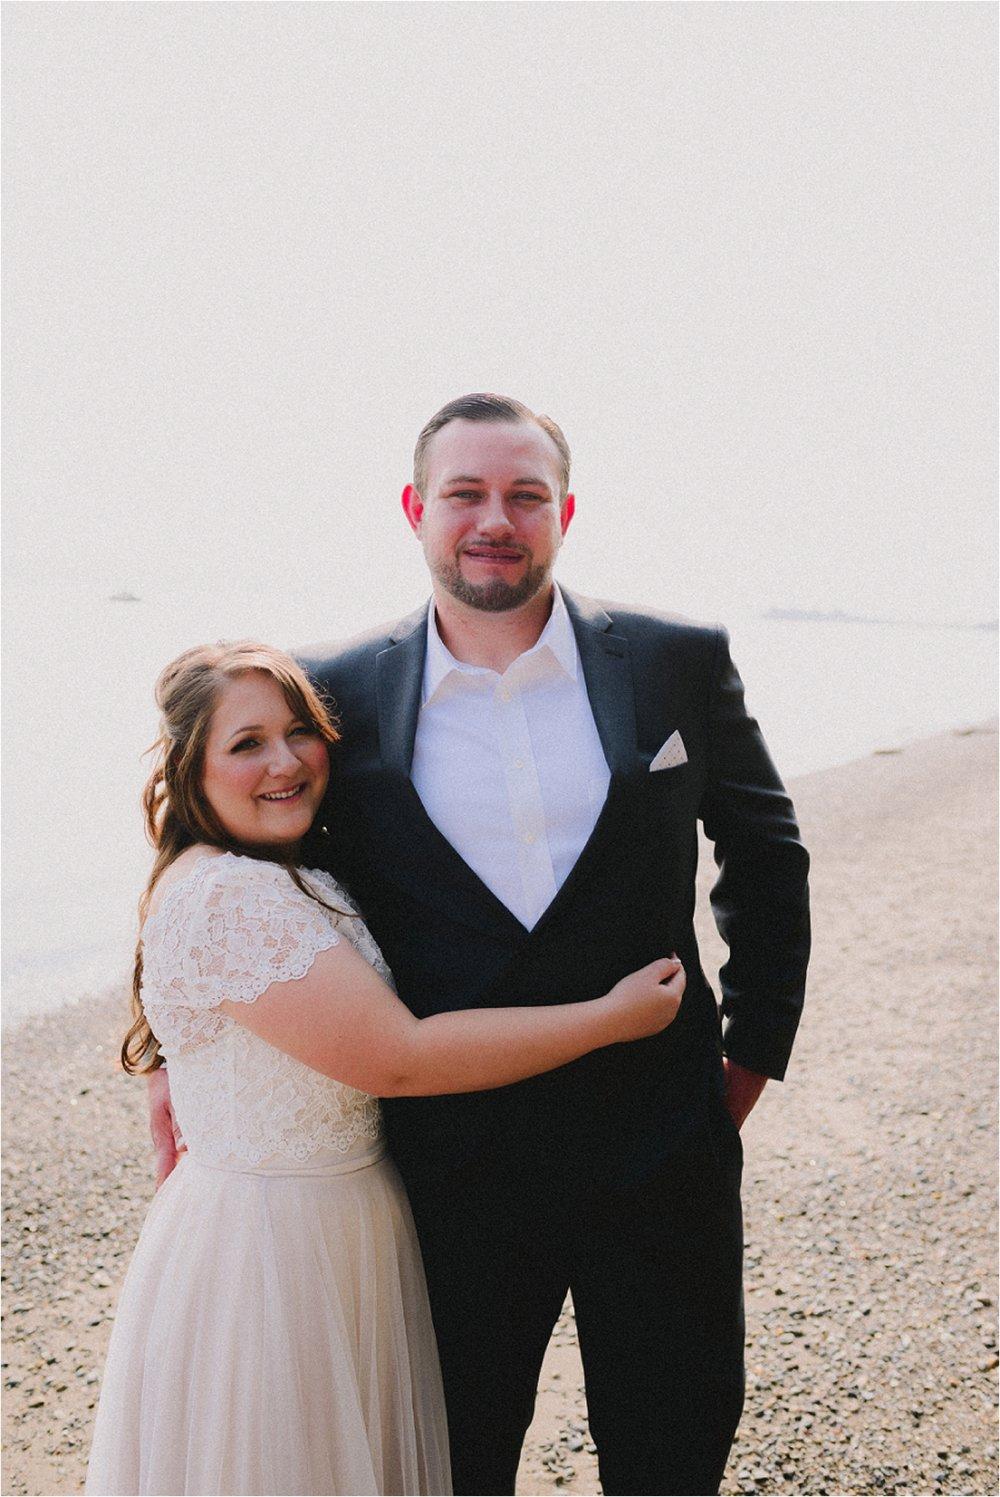 owen-beach-priest-point-park-tacoma-washington-elopement-jannicka-mayte-anchorage-alaska-wedding-elopement-photographer (15).jpg